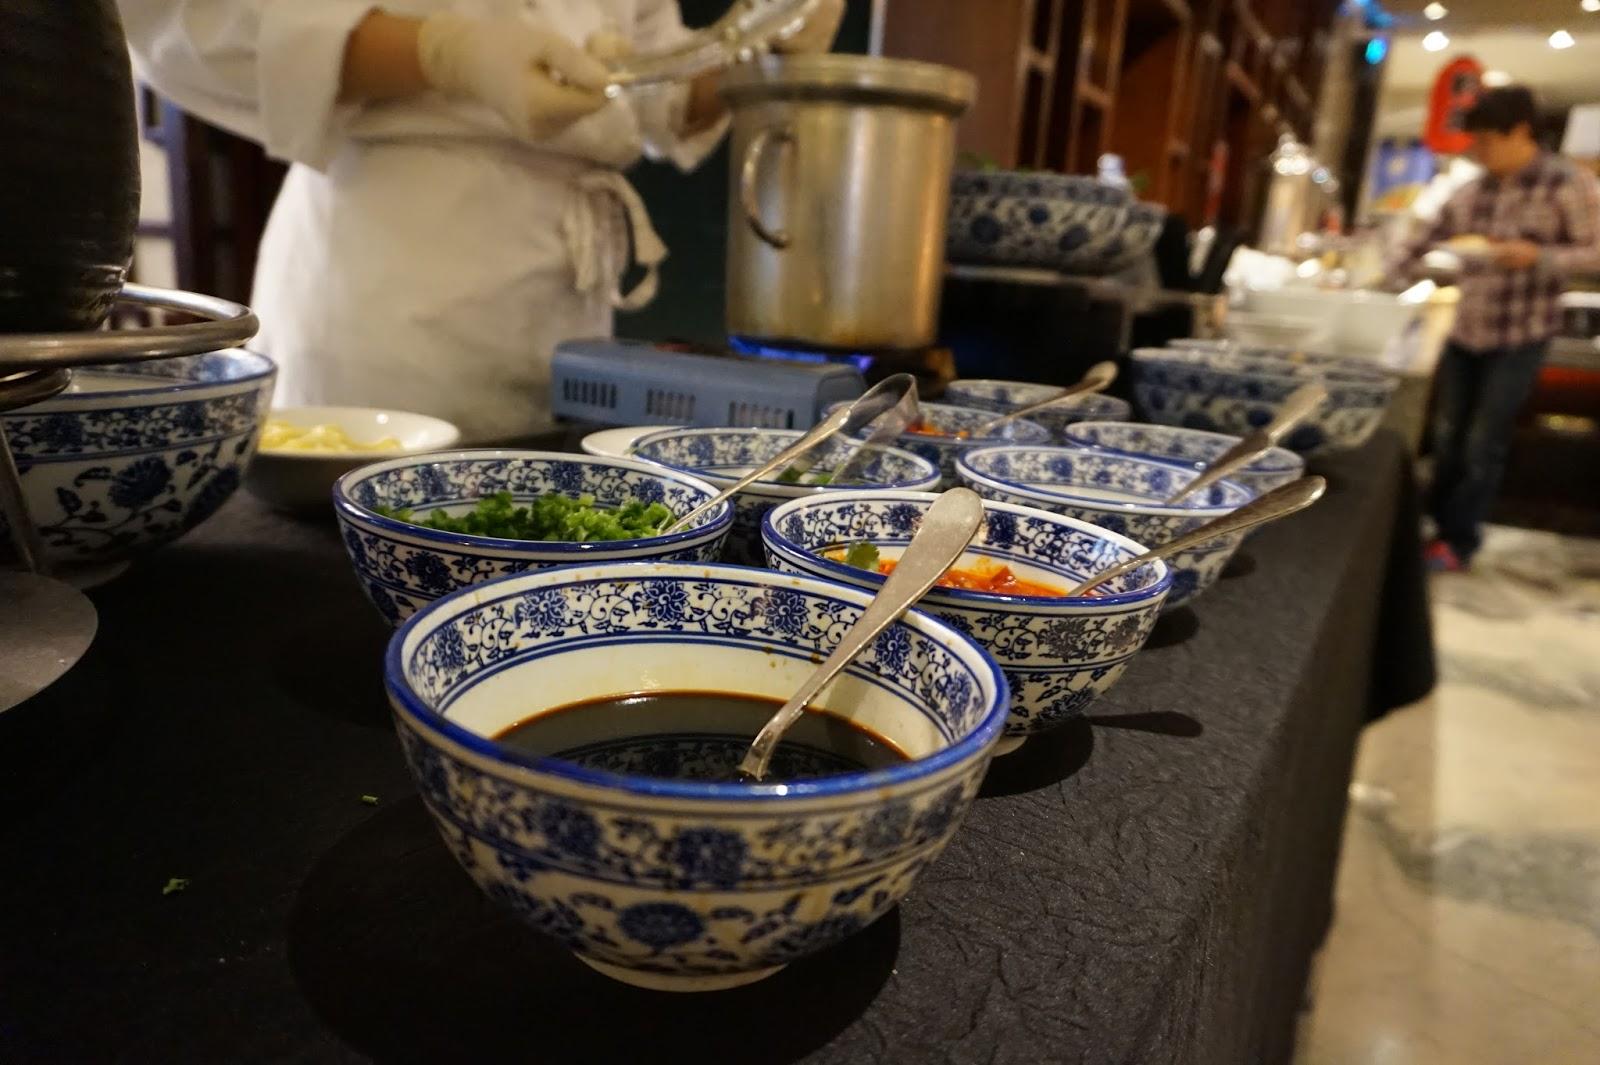 portman ritz-carlton shanghai china prc hotel review tables restaurant breakfast buffet